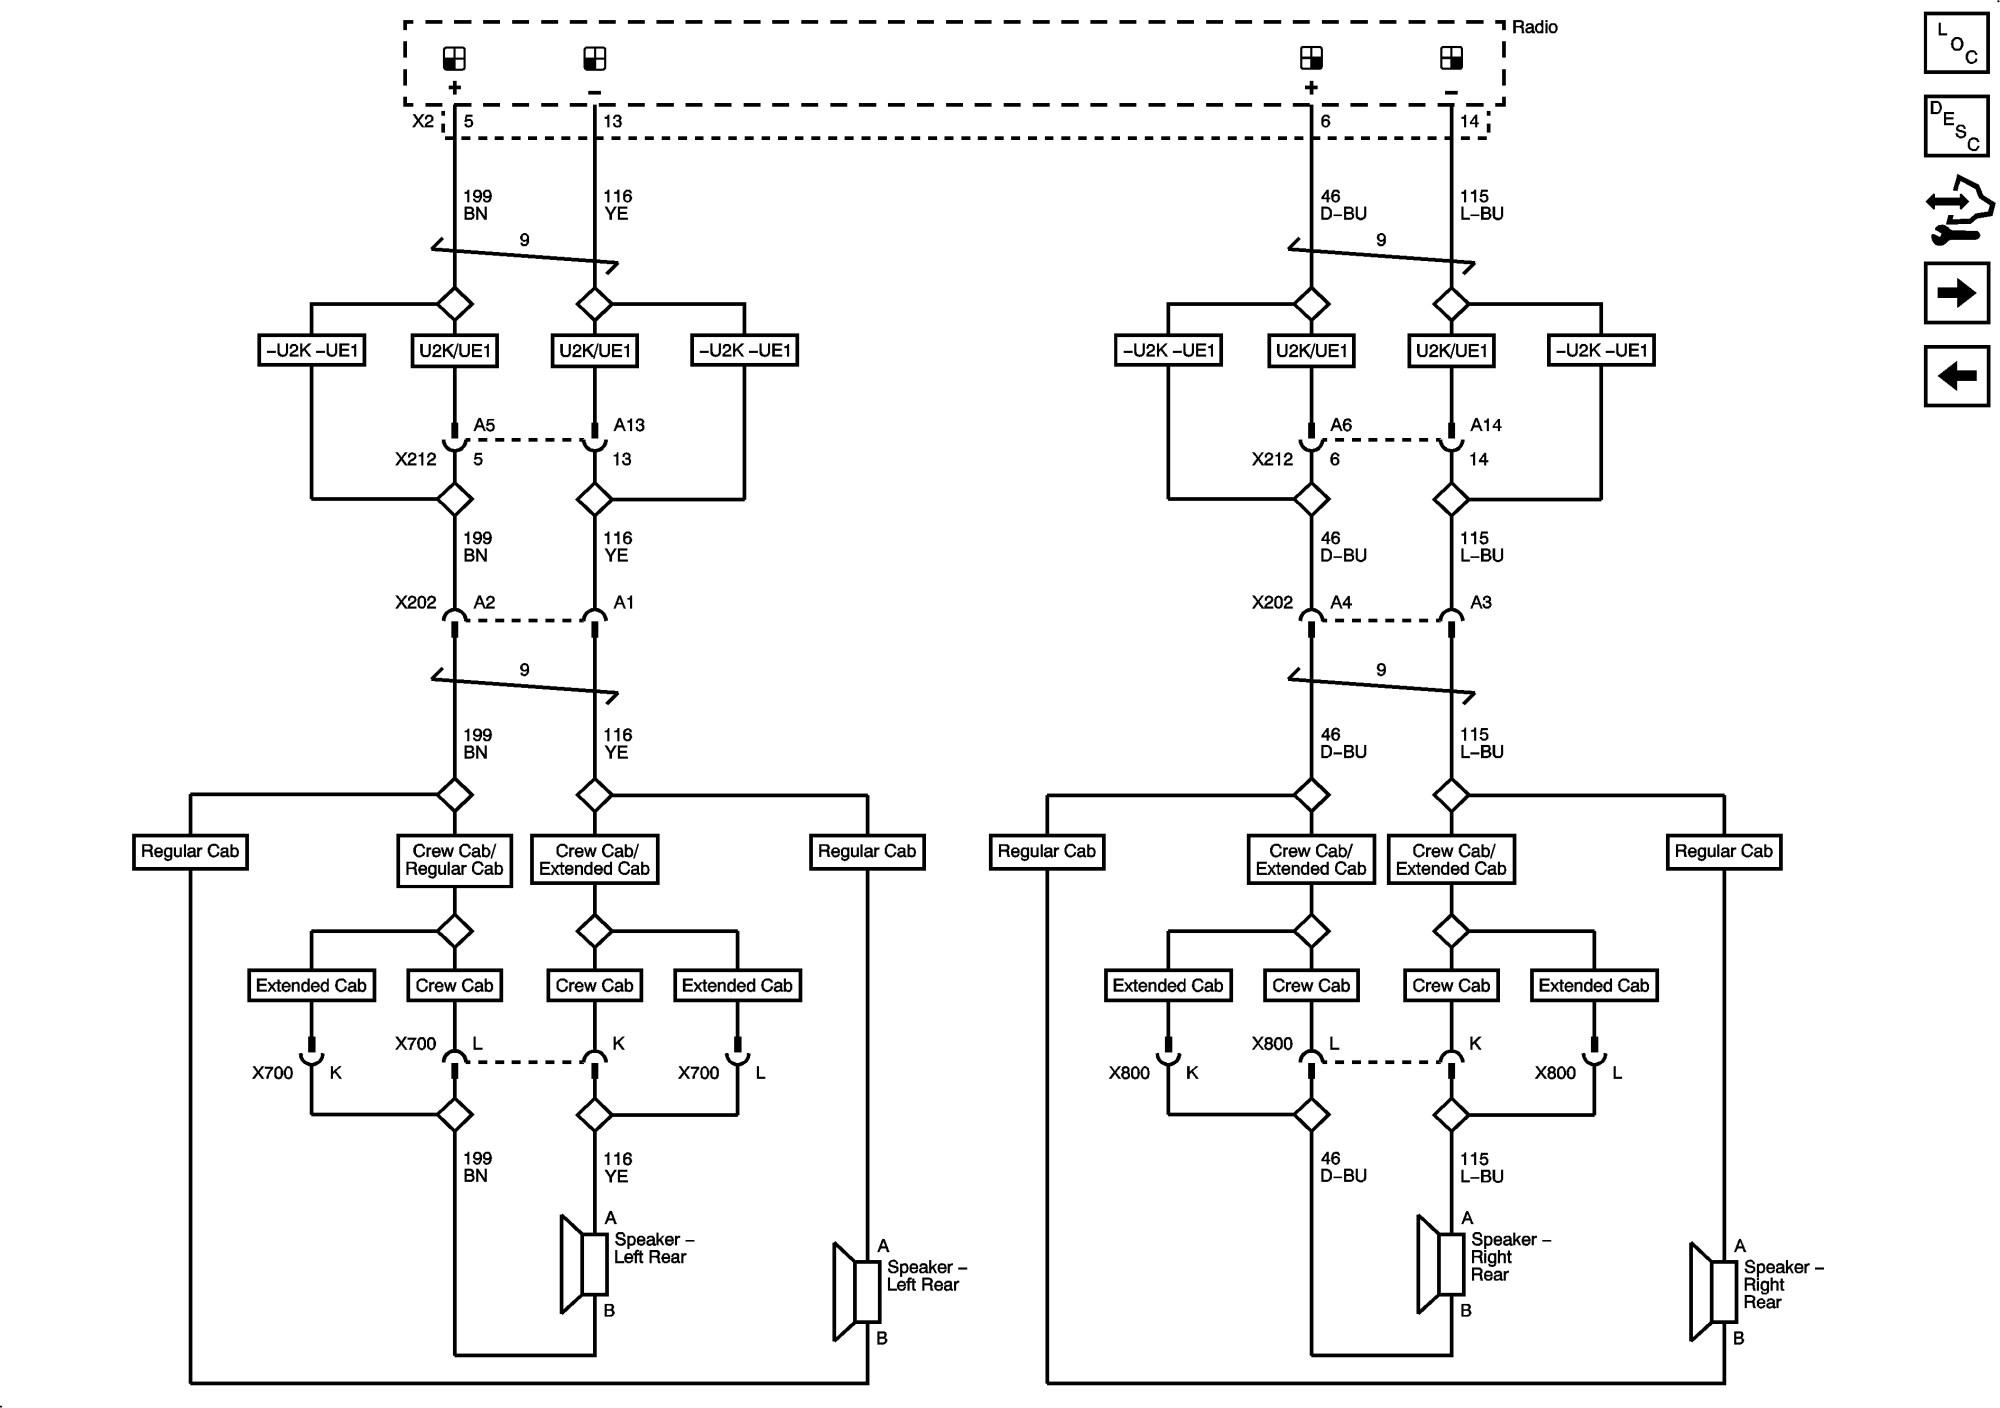 hight resolution of 2003 chevy silverado instrument cluster wiring diagram 03 silverado radio wiring harness collection unique 2003